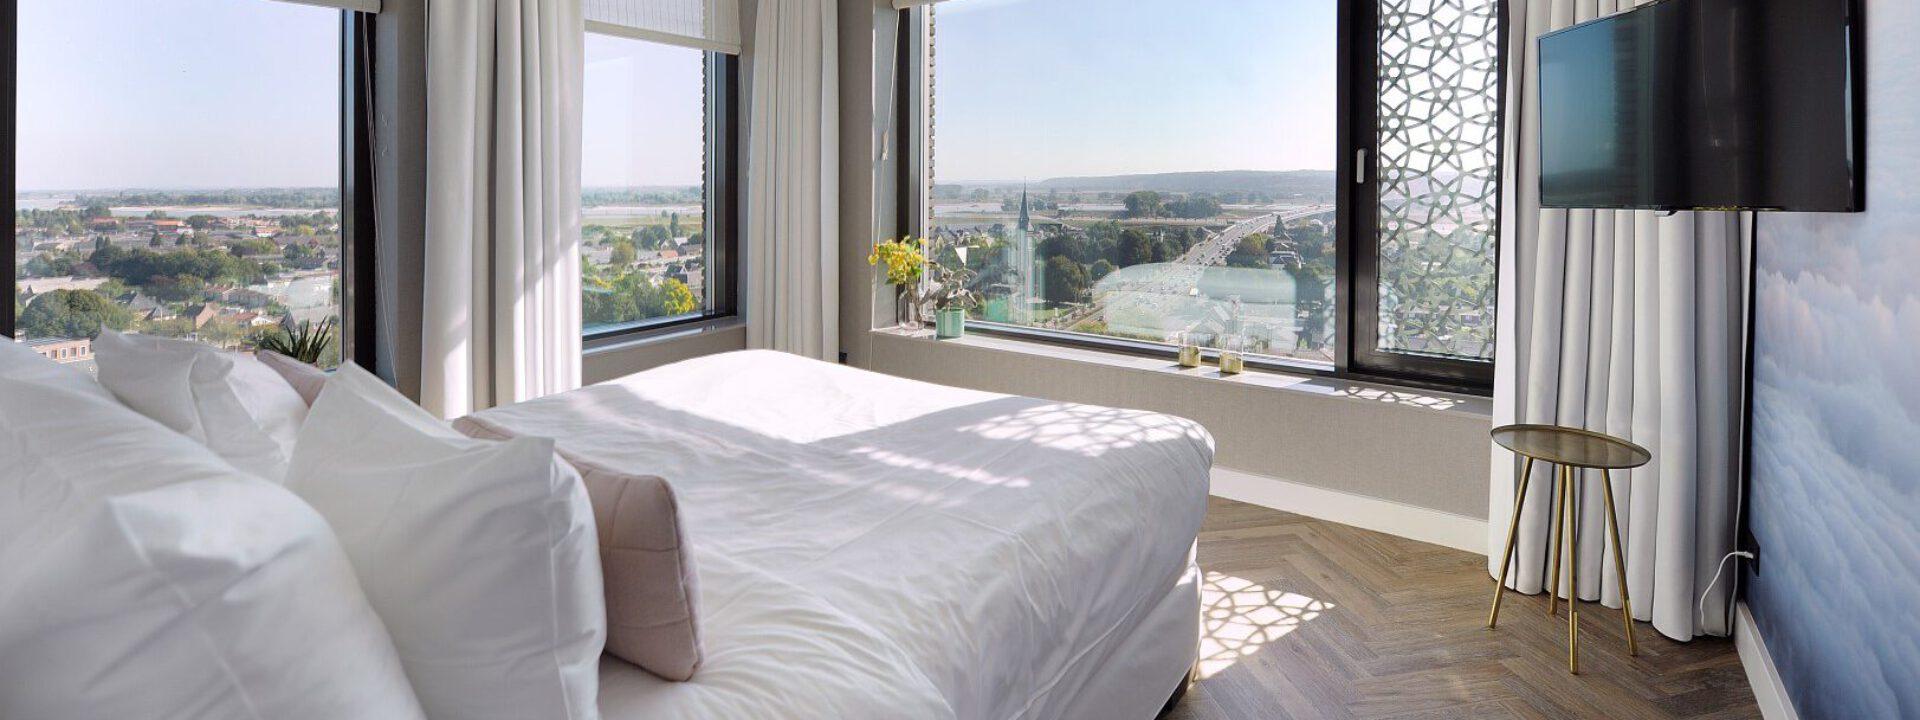 Hendriks Hoteldiensten, Hotel Cleaning Company en EW Facility Services bundelen krachten